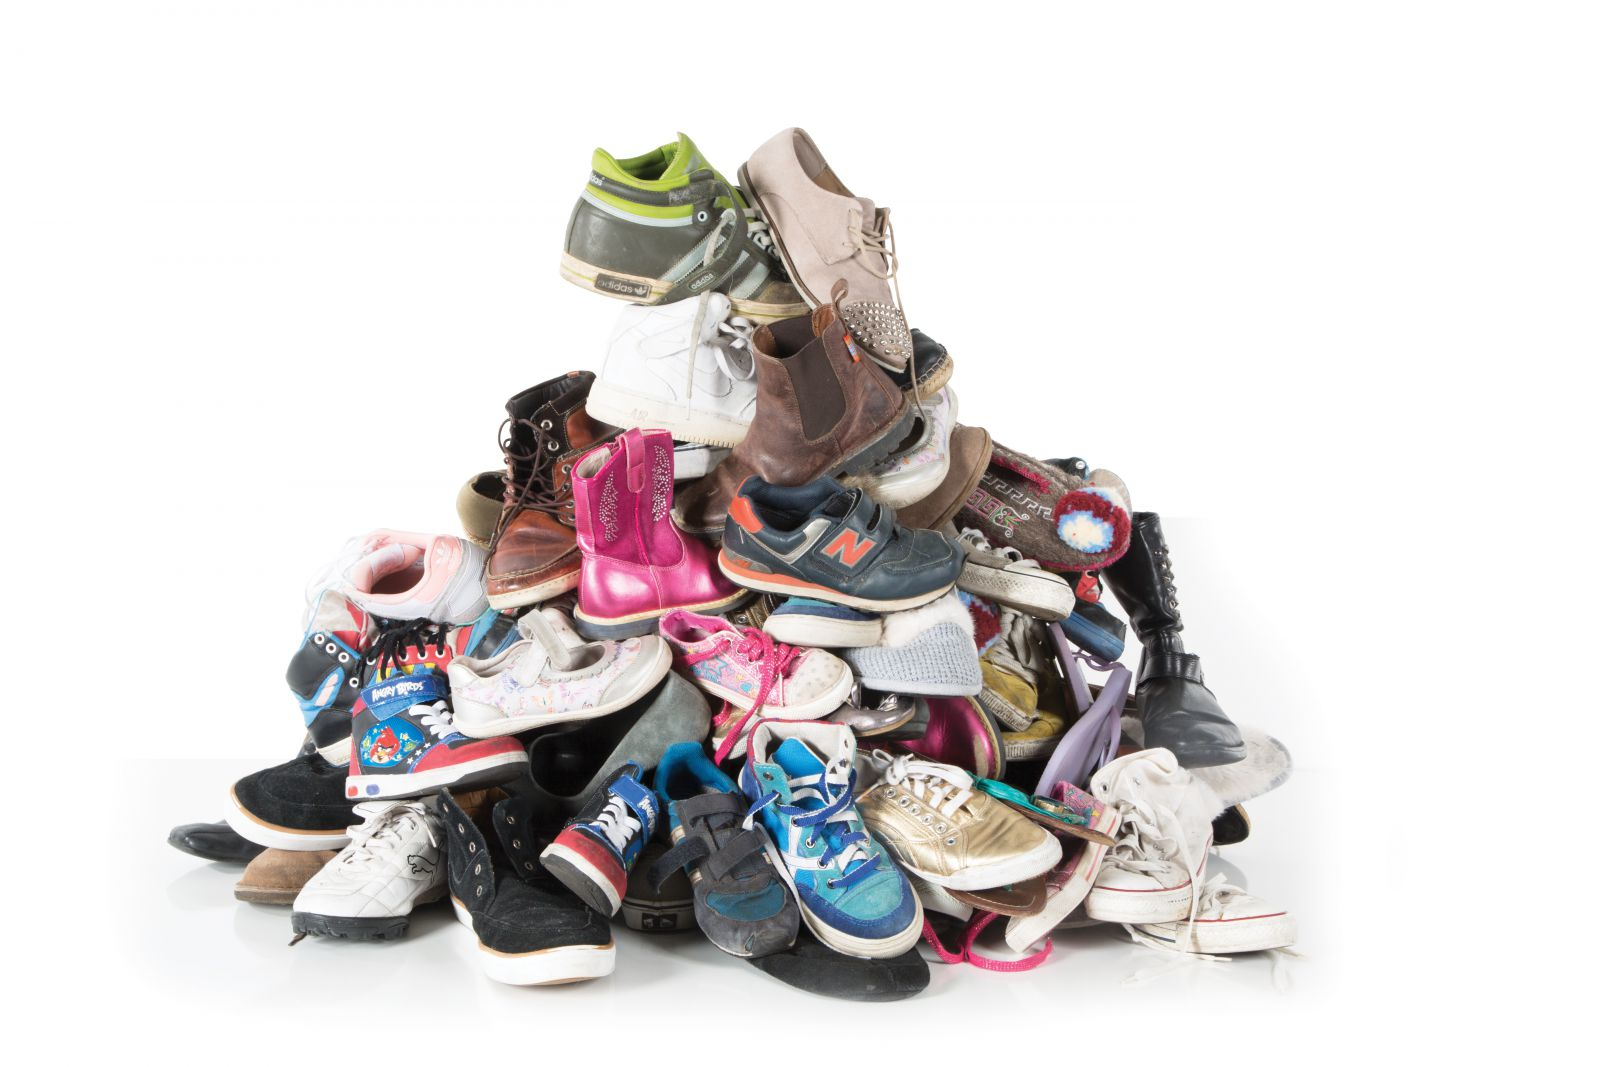 691b5c8197d Wil je toch stiekem heel graag die nieuwe sneakers van Nike of die zwarte  pumps met die slanke hak? Wellicht is deze actie dan wat voor jou.